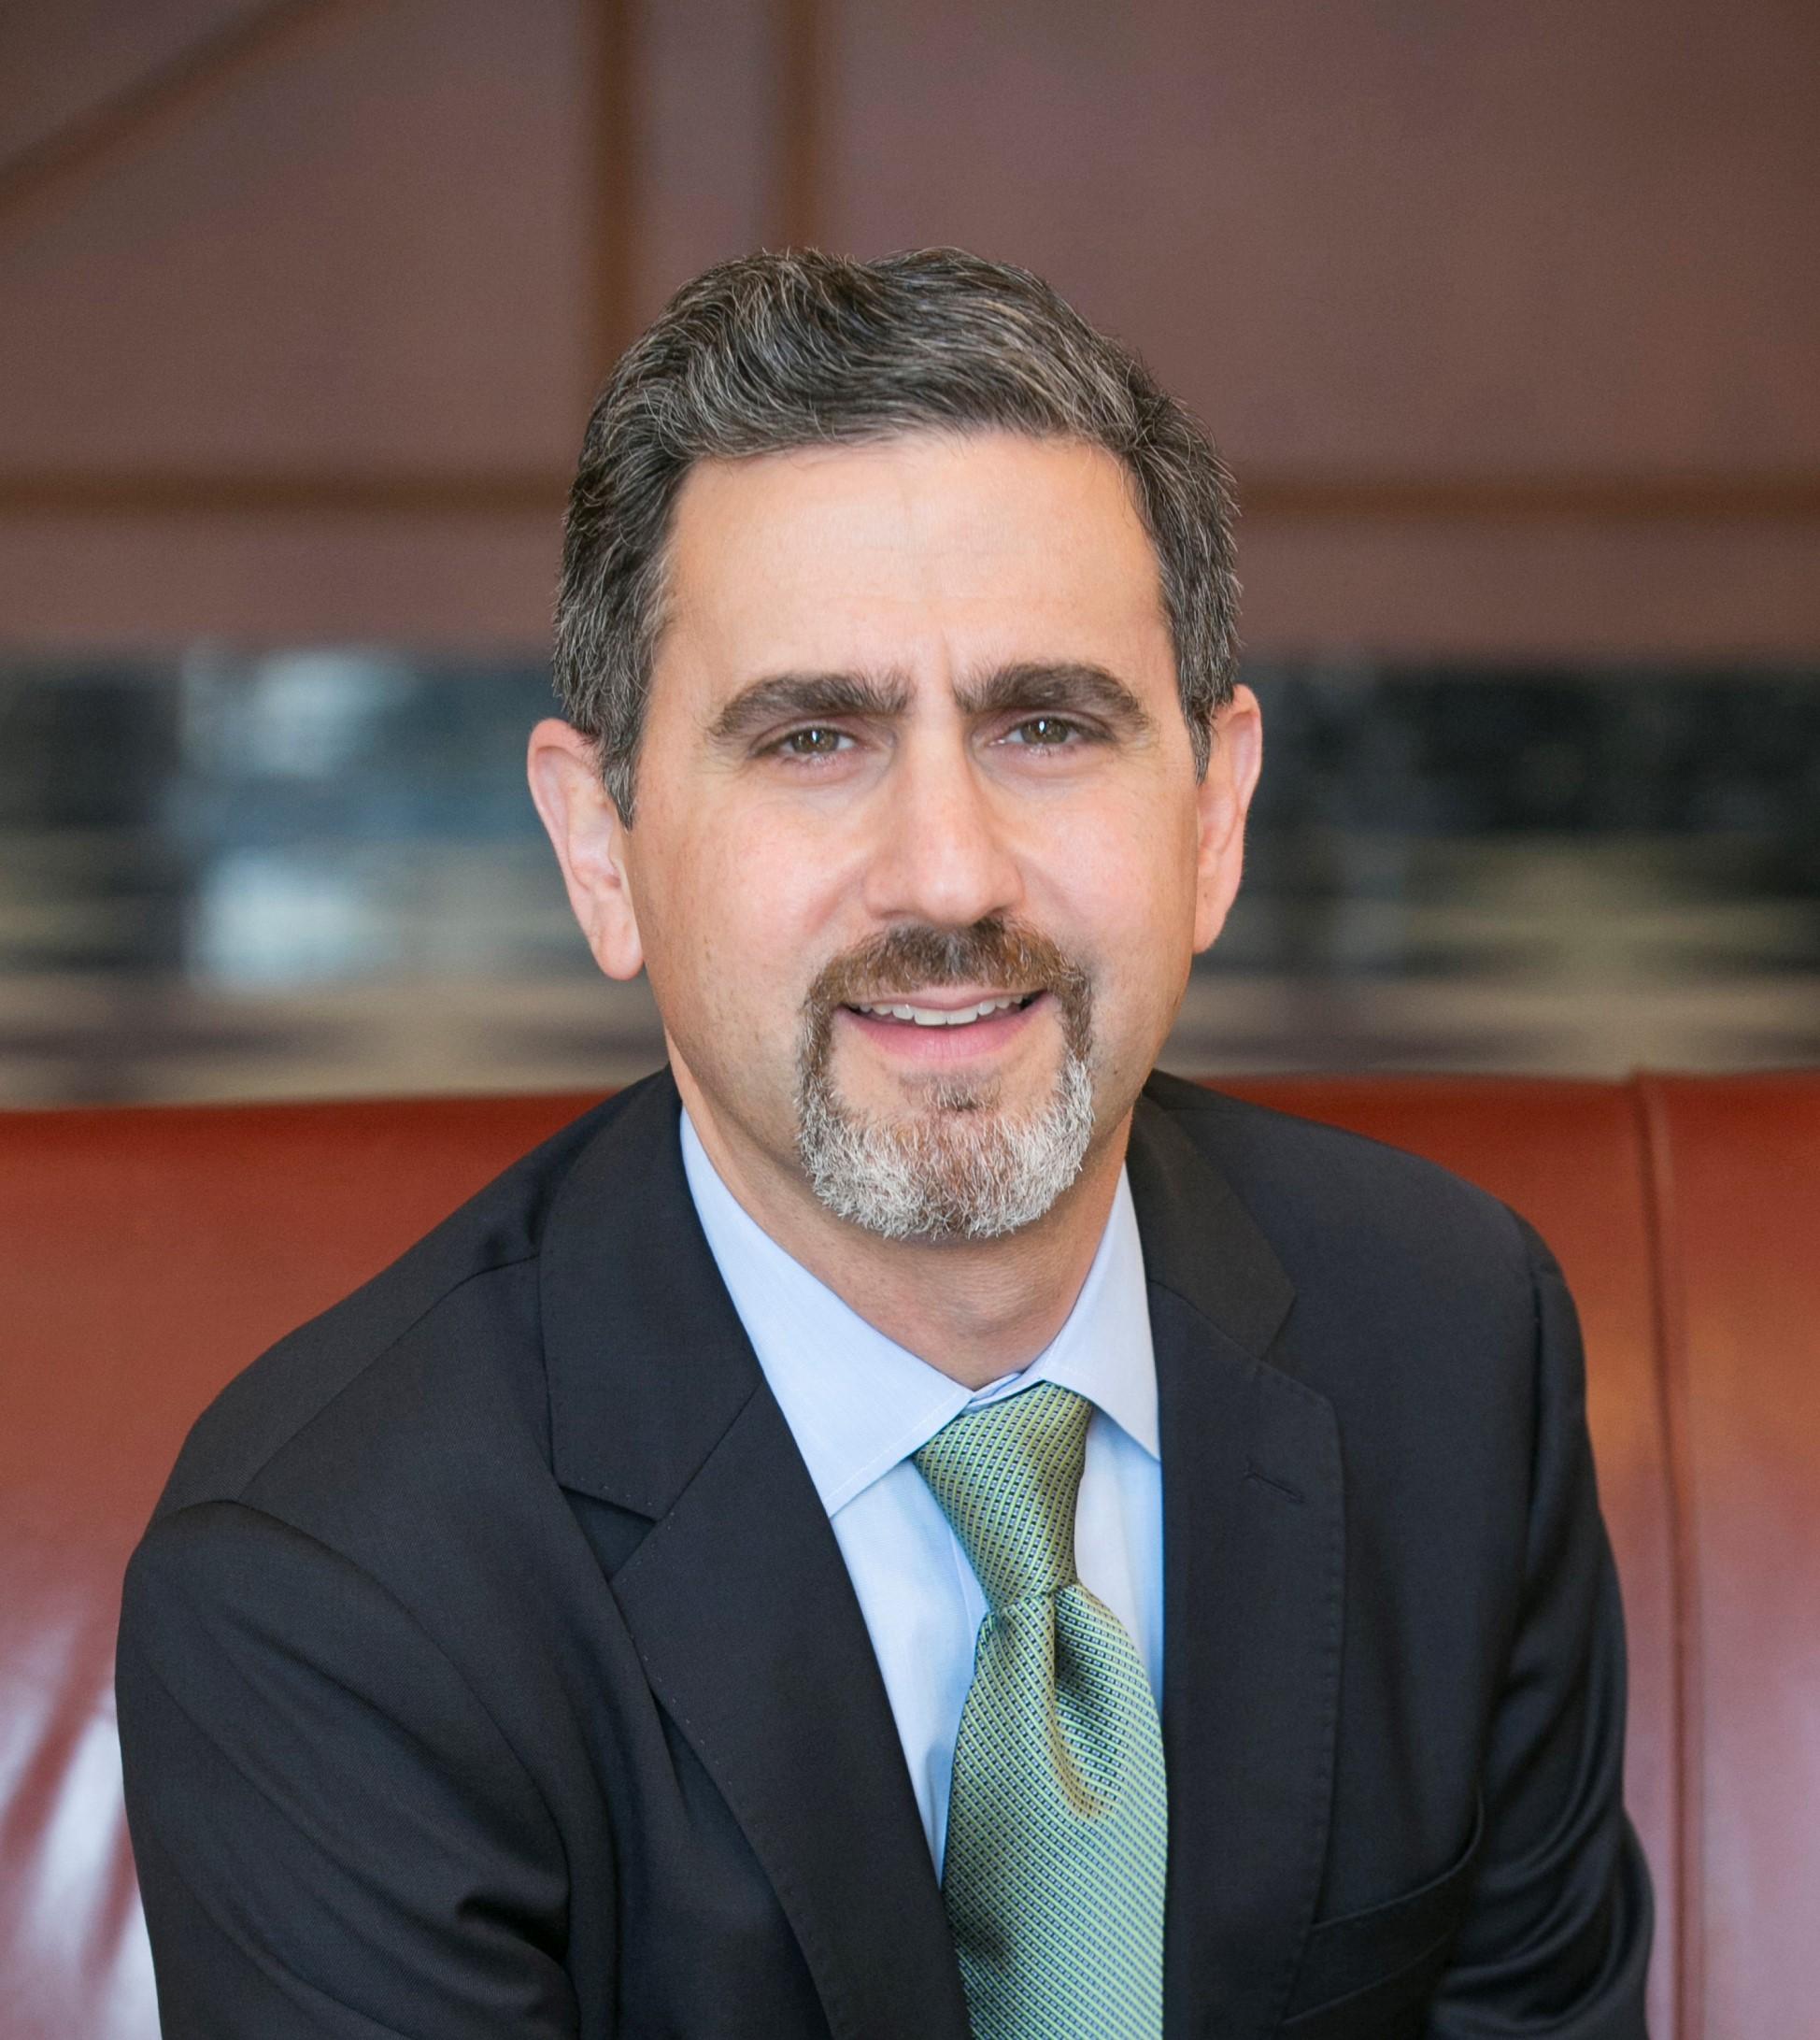 Robert Huckman, PhD